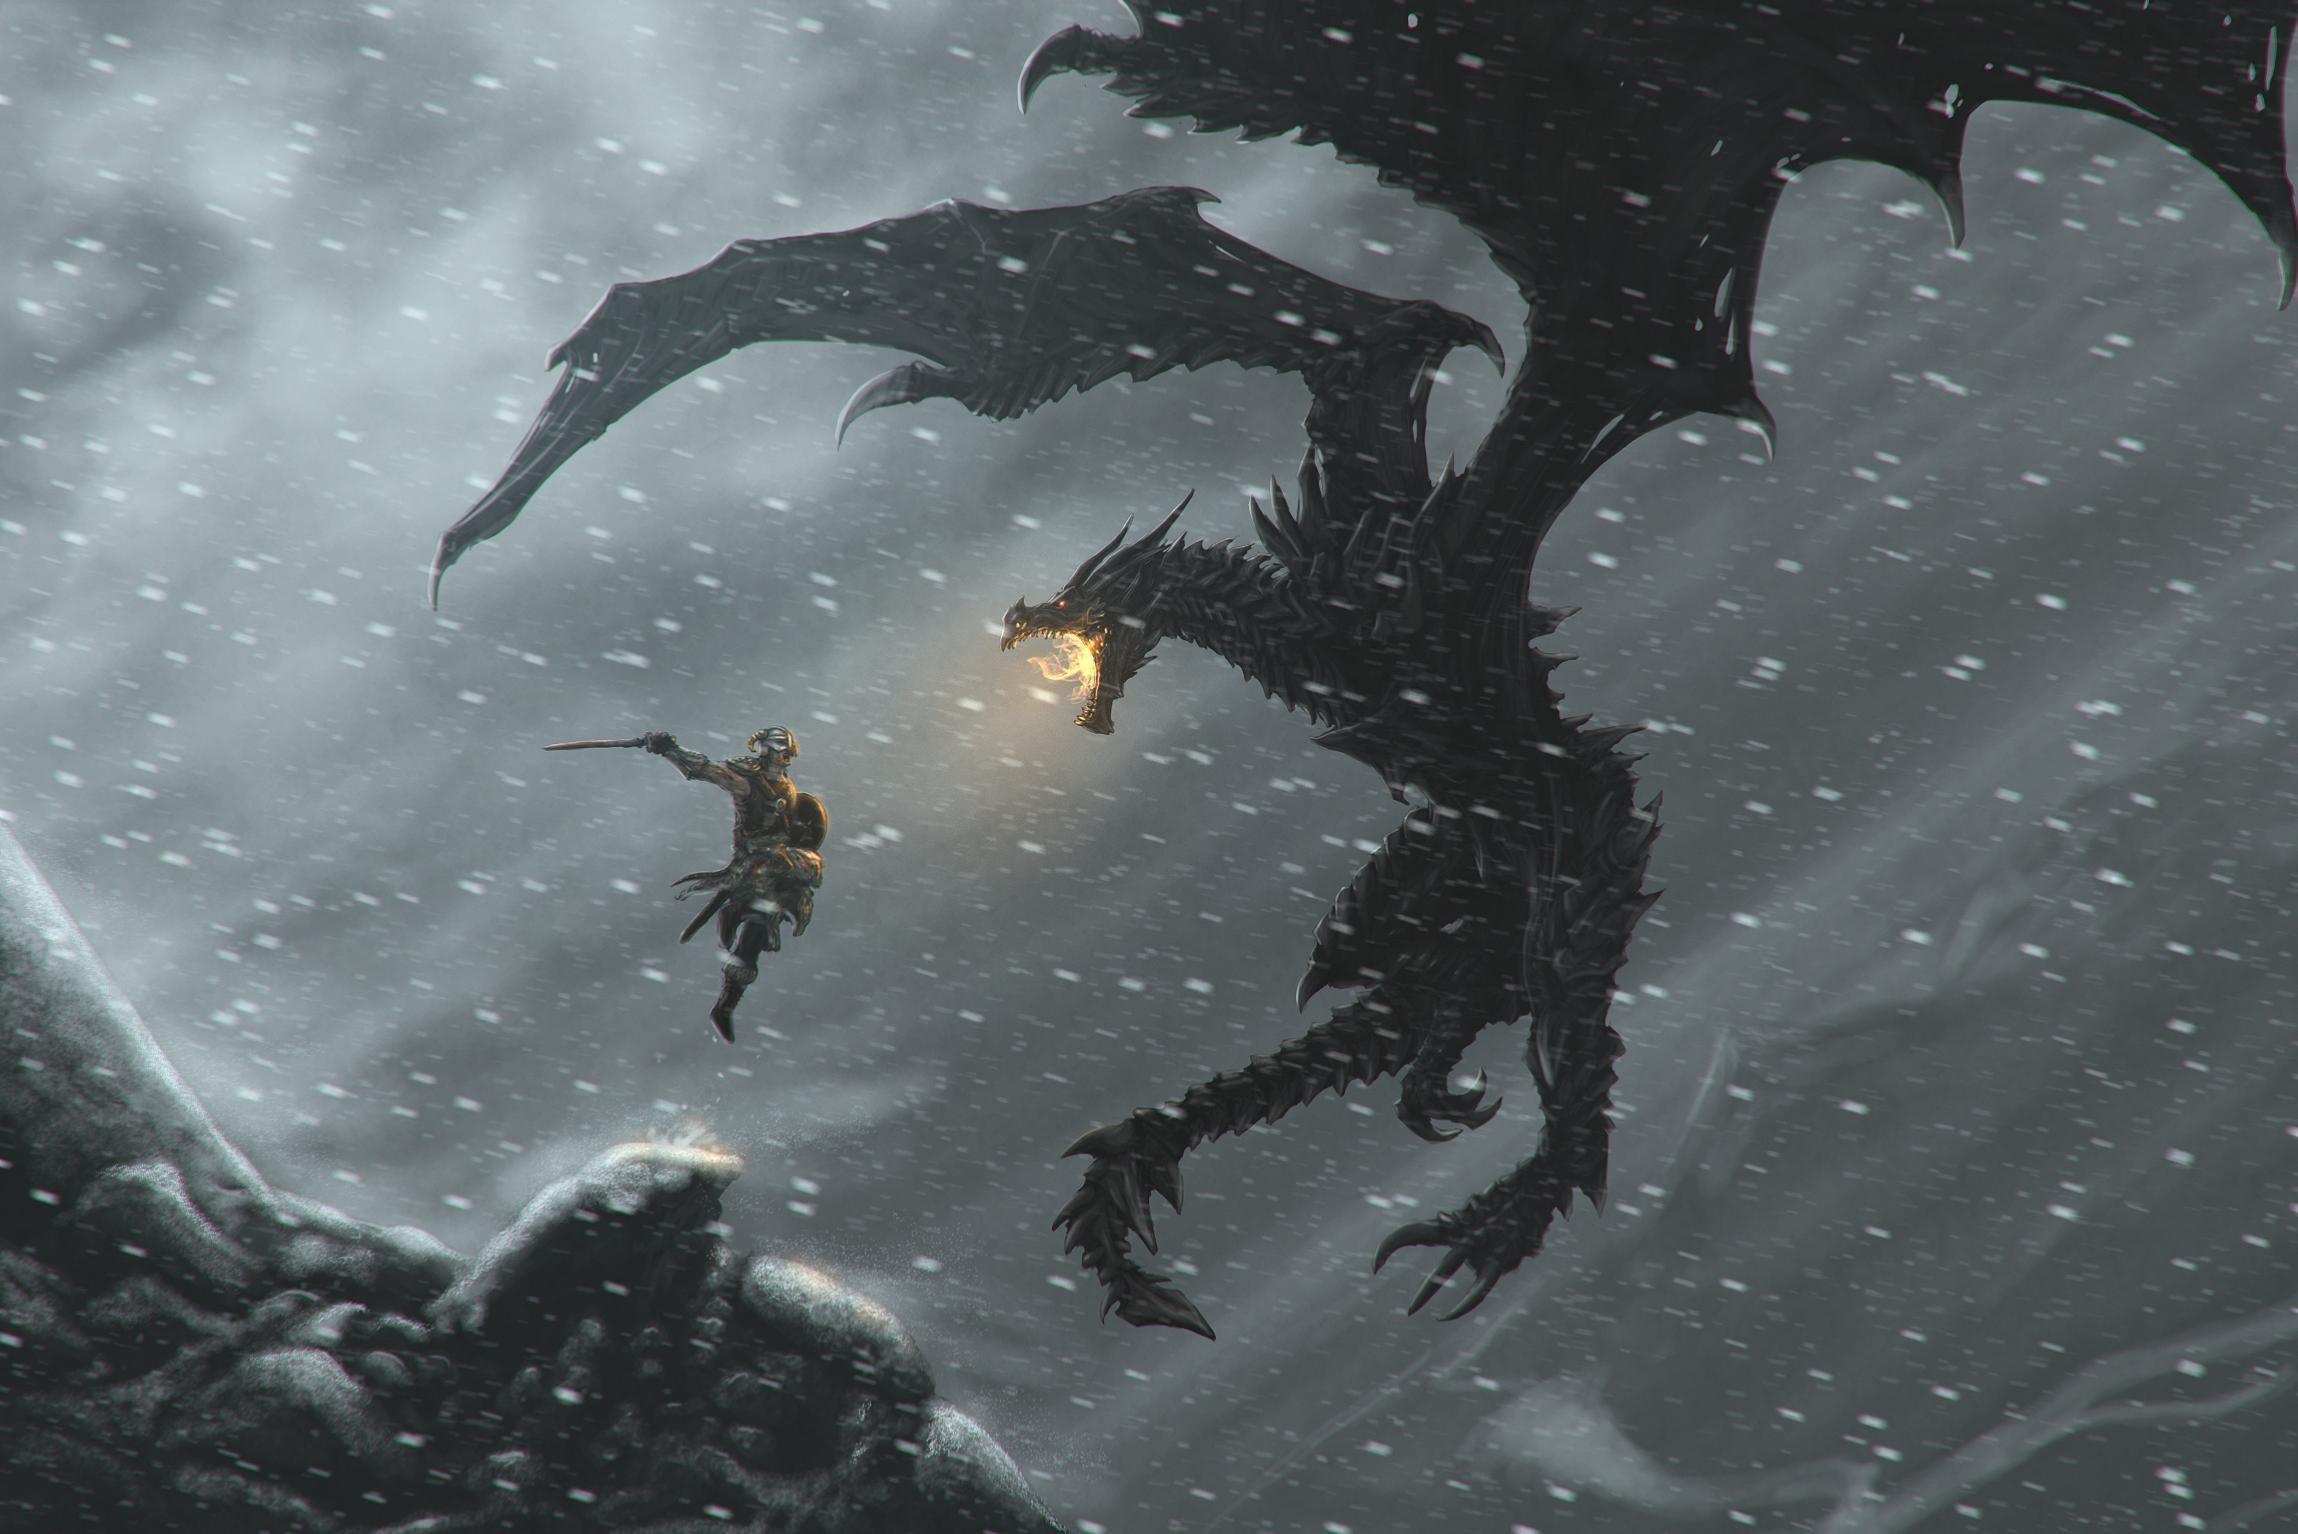 1236 The Elder Scrolls V: Skyrim HD Wallpapers   Backgrounds – Wallpaper  Abyss